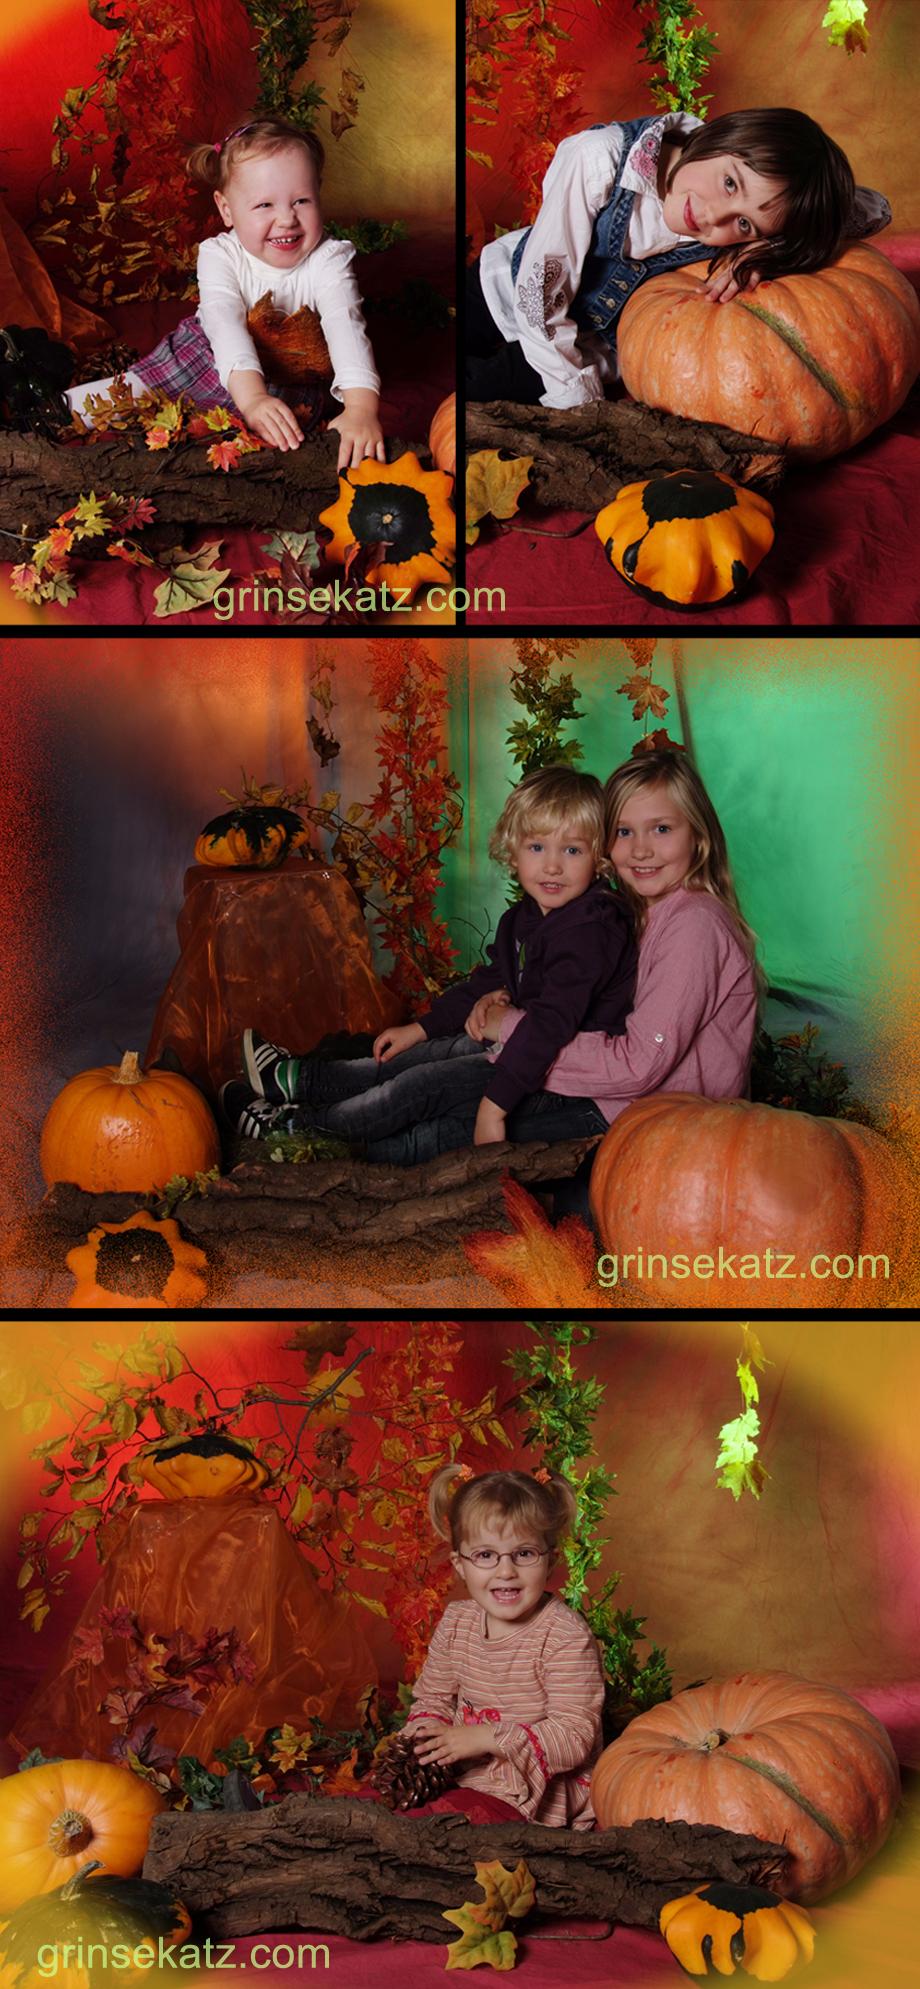 halloween2011 grinsekatz